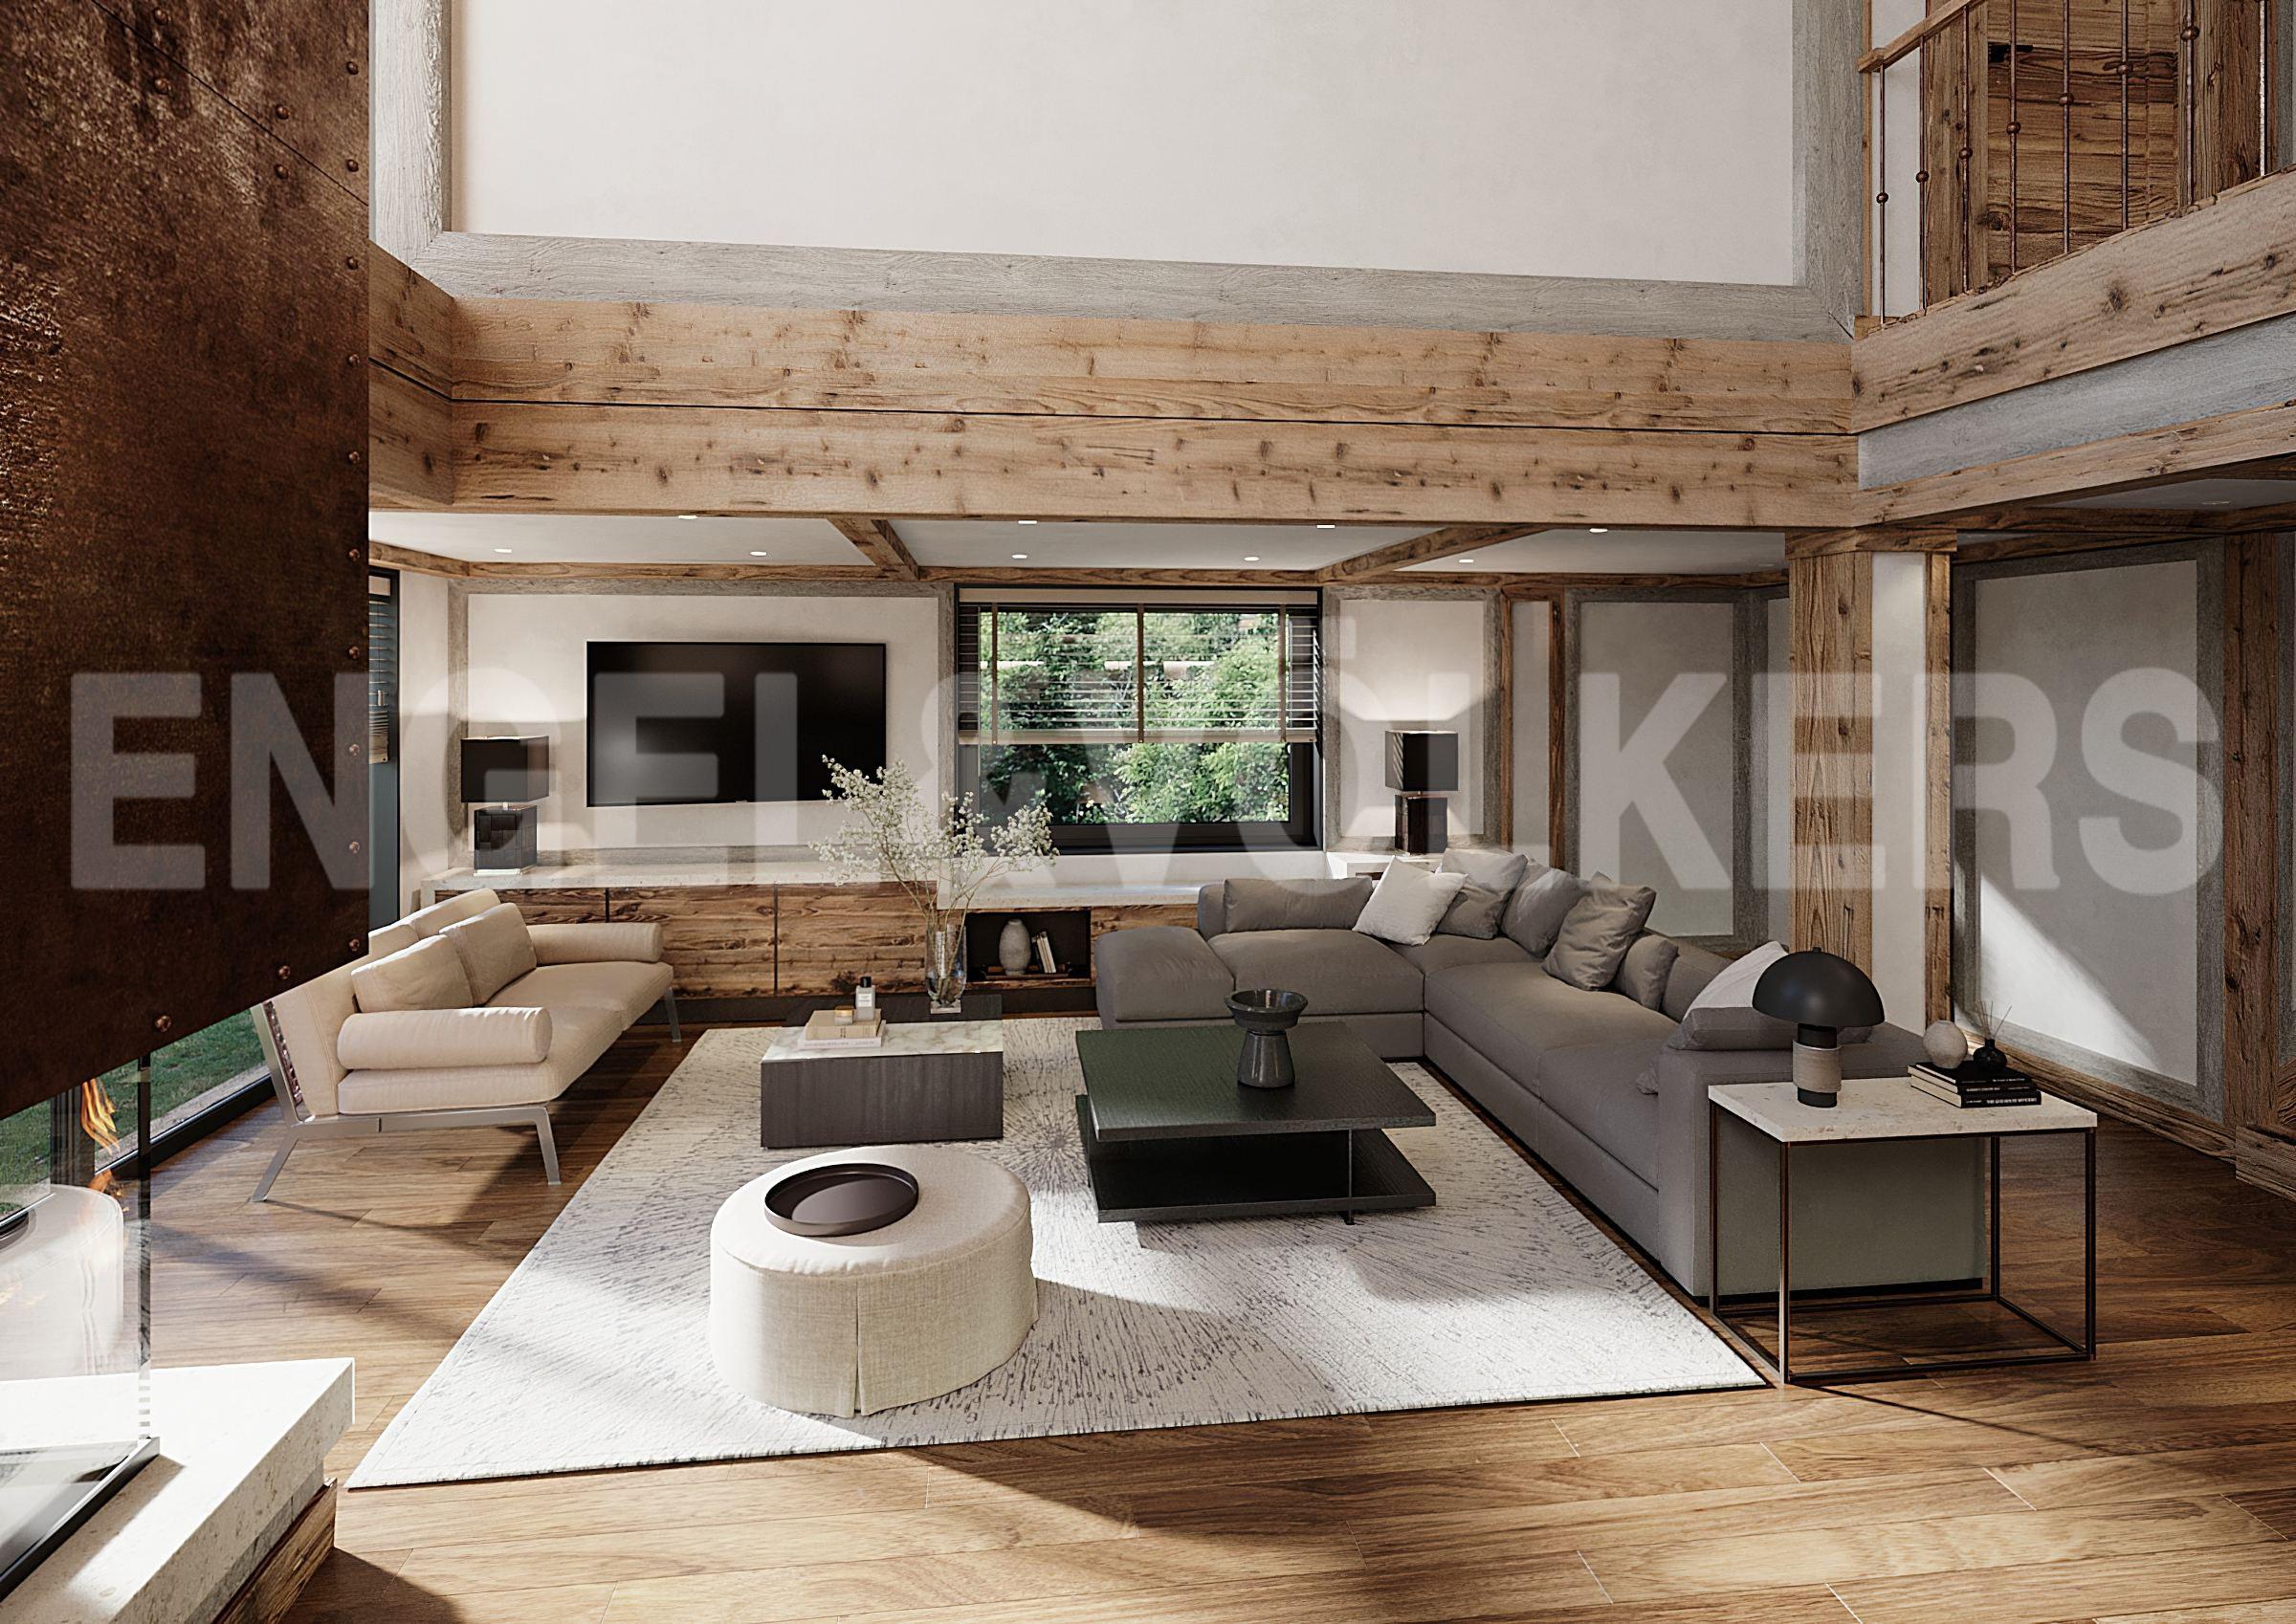 Xalet en venda a Sispony, 4 habitacions, 1019 metres